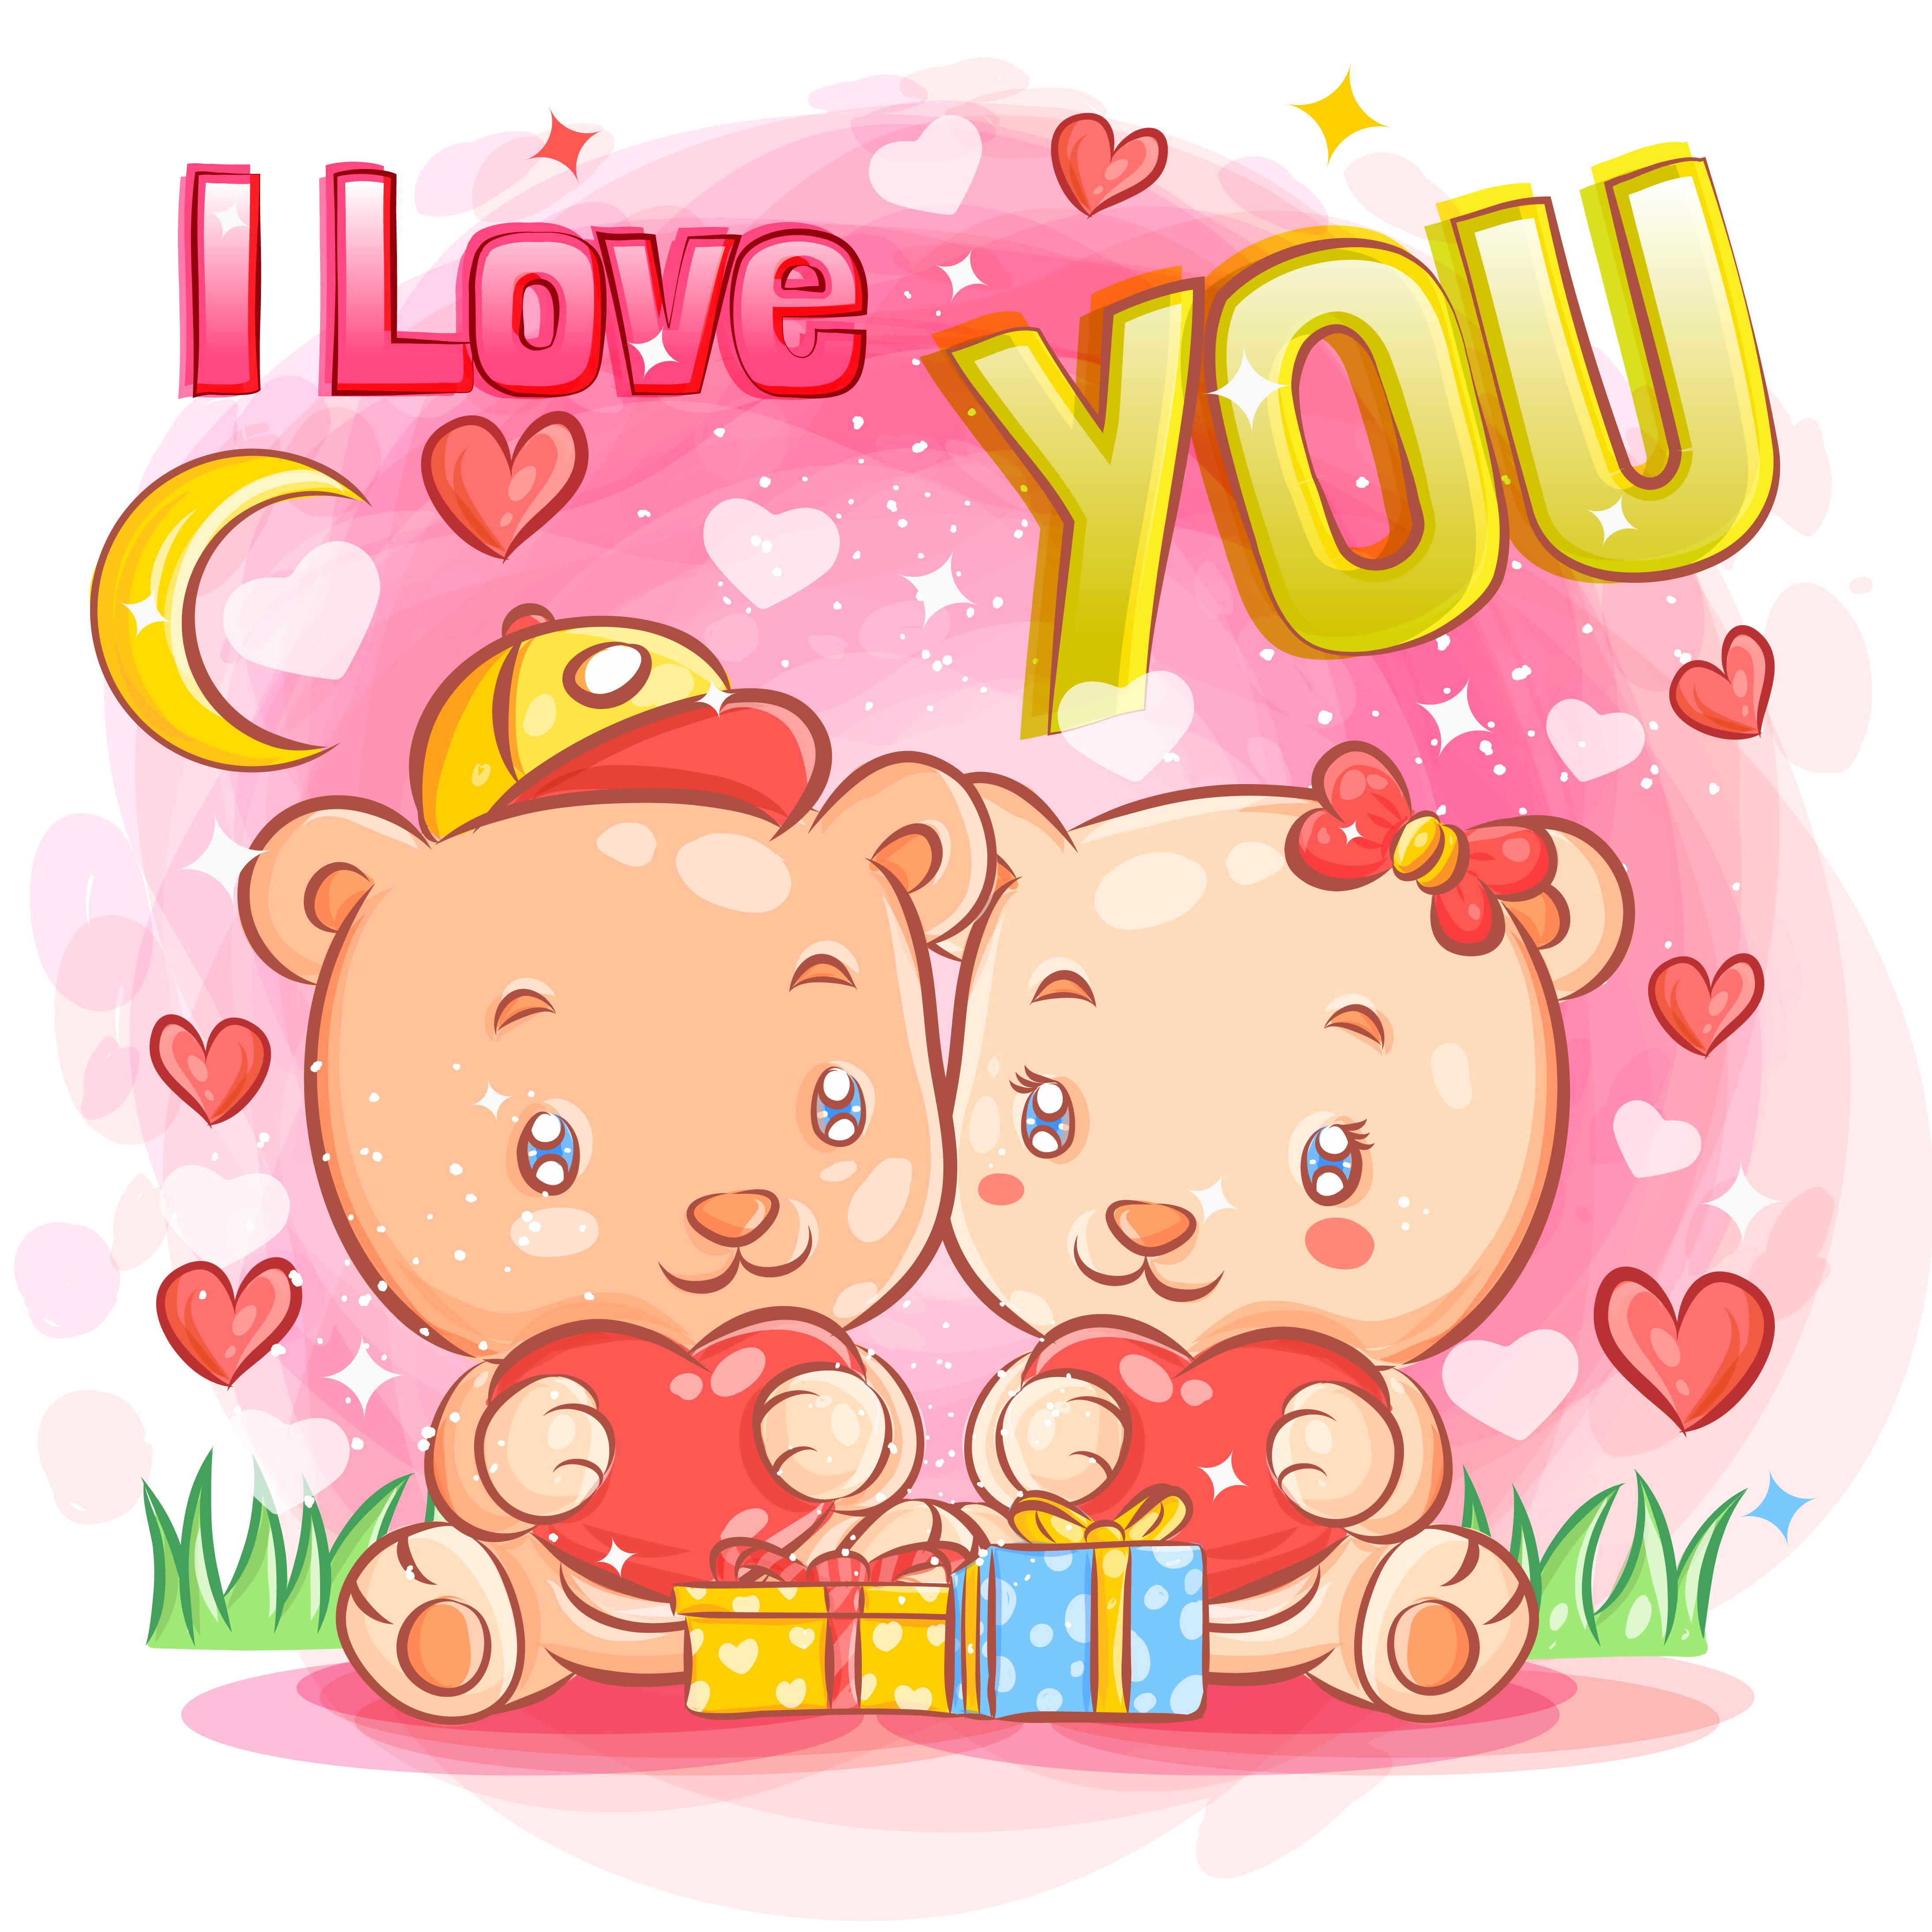 Cute Bear Couple Feeling in Love on Valentine's Day